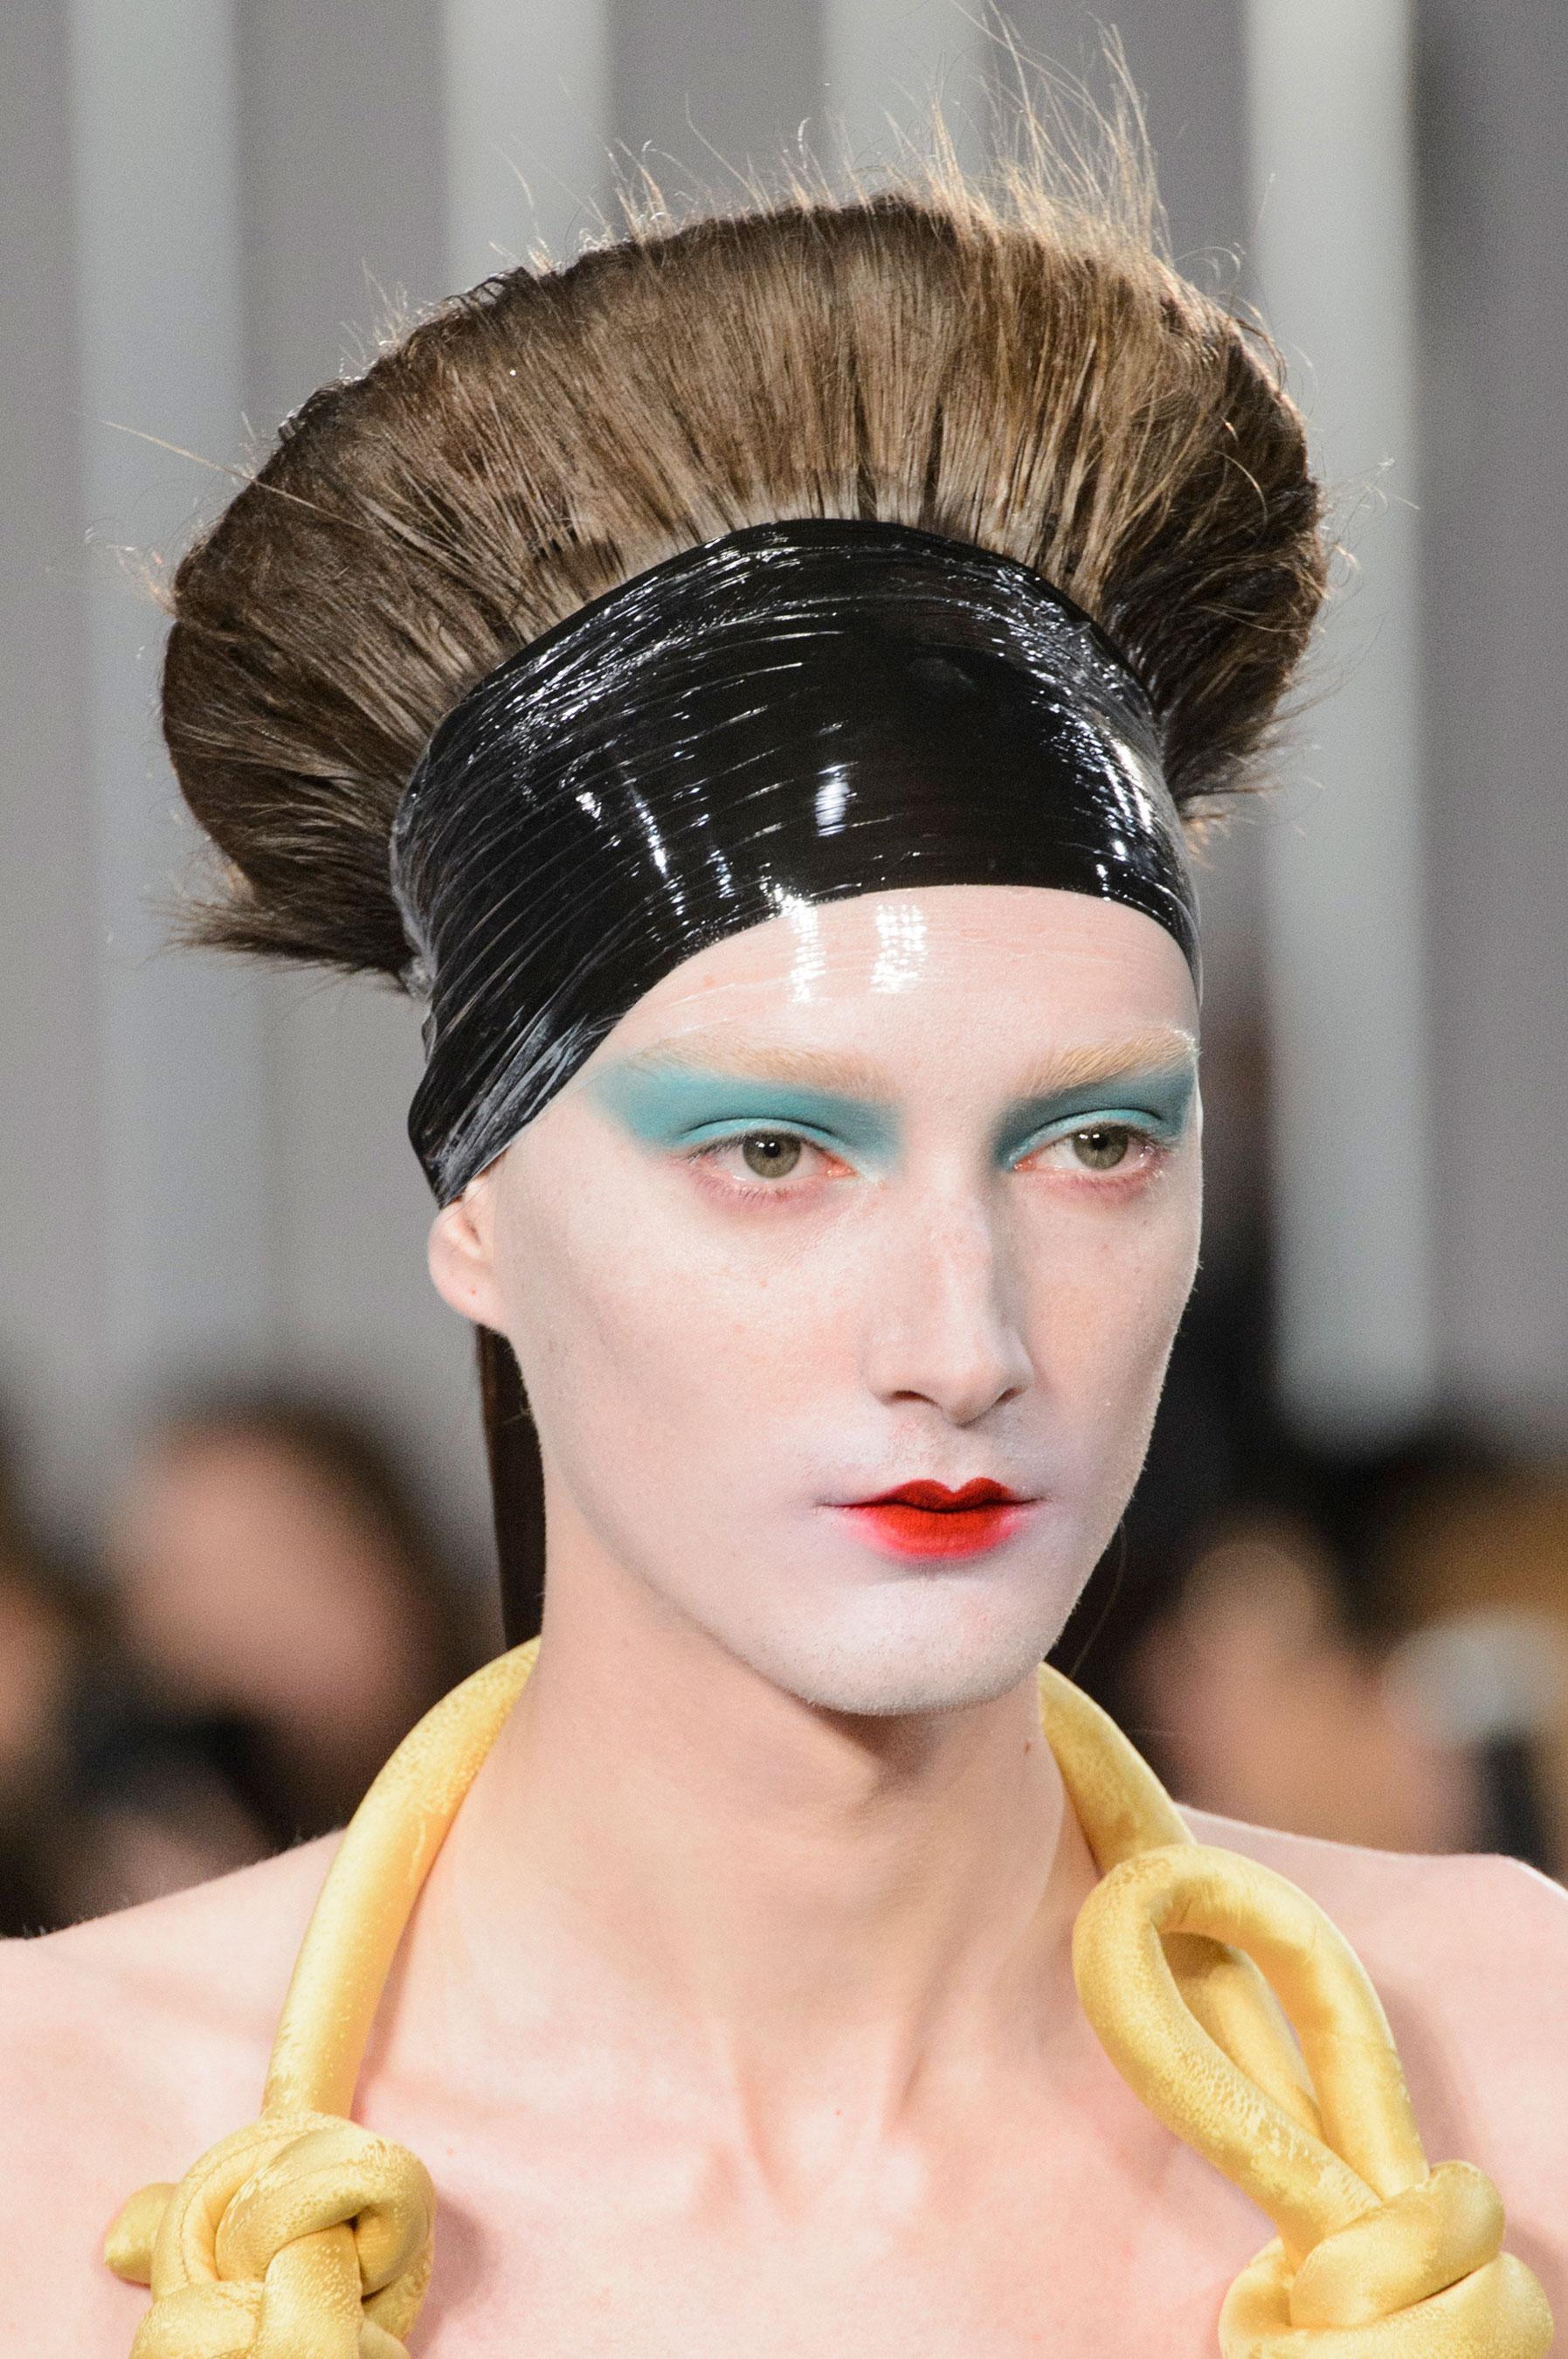 Maison-Margiela-spring-2016-runway-beauty-fashion-show-the-impression-030